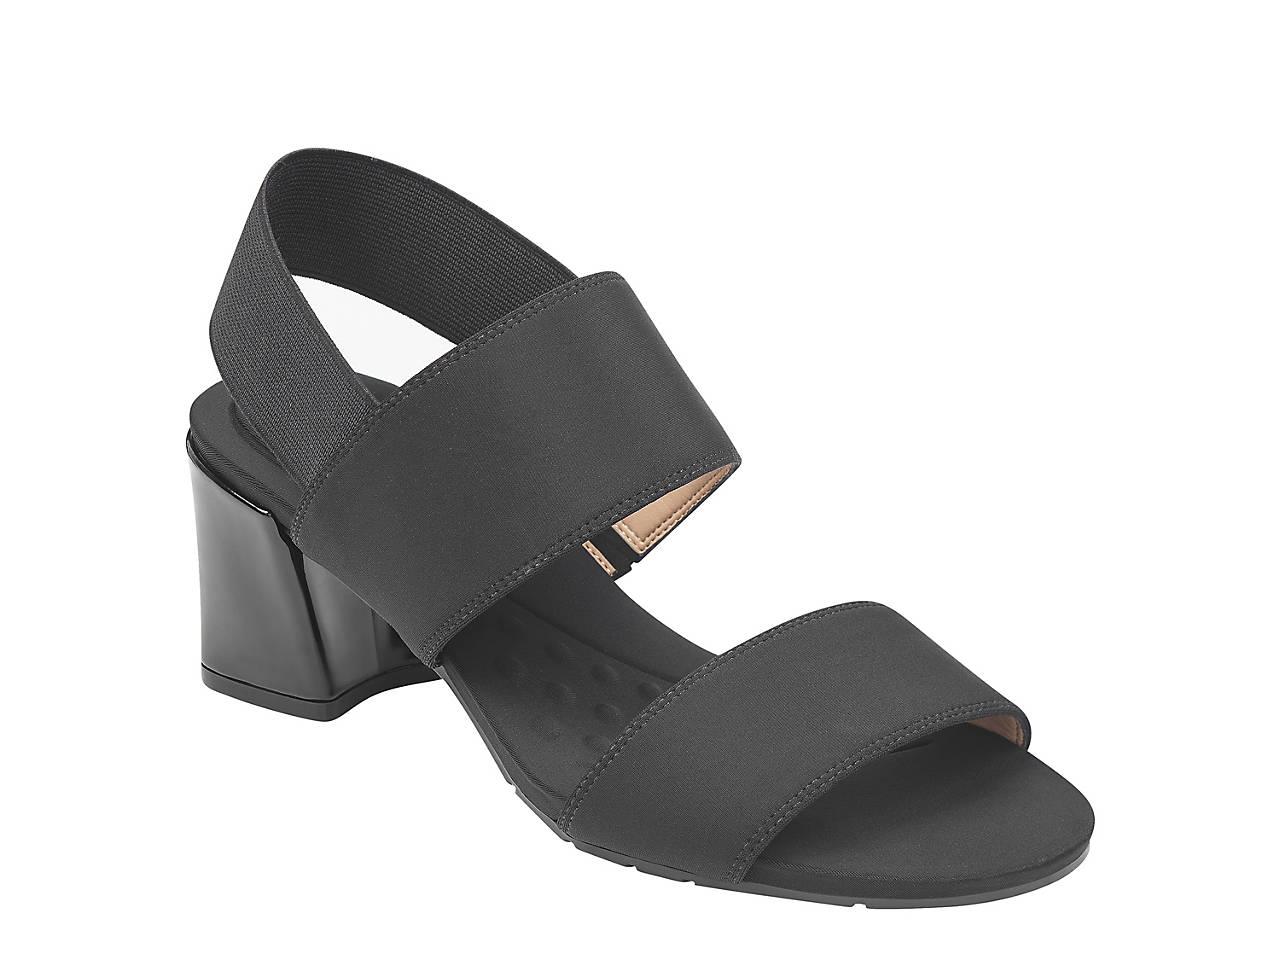 136fee6290ed Easy Spirit Gatilda Sandal Women s Shoes